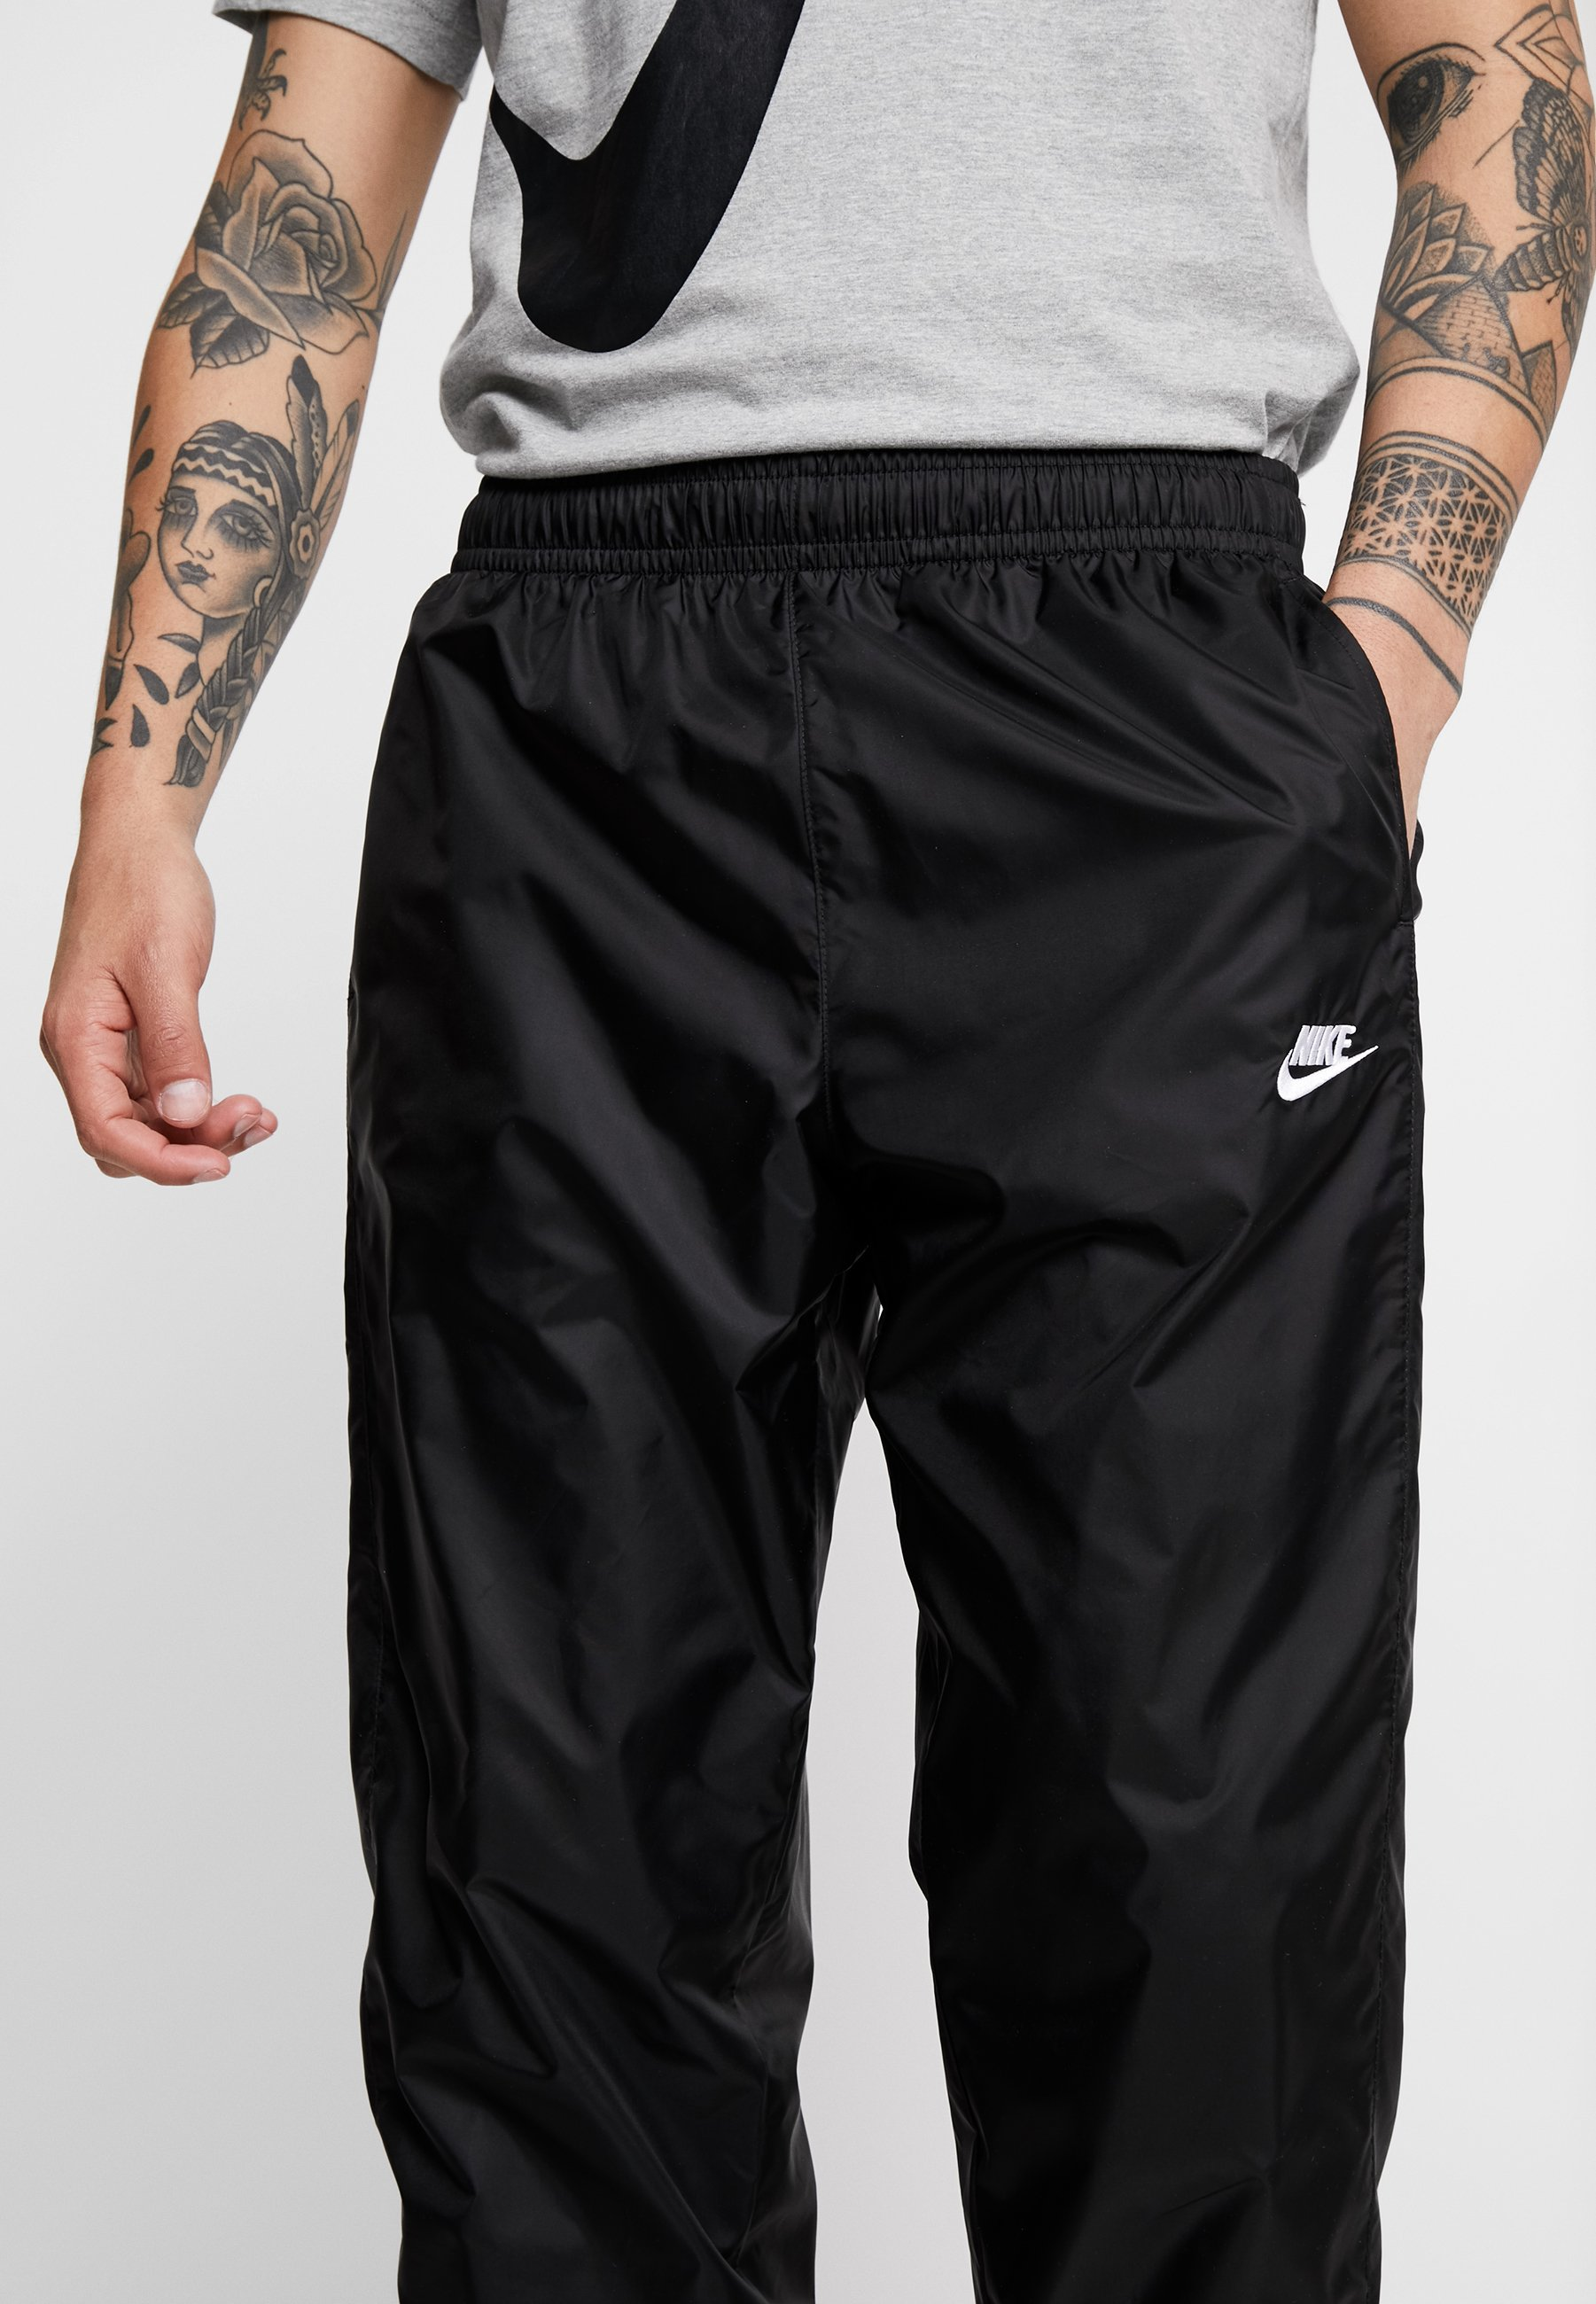 Nike SuitSurvêtement Nike Nike Sportswear Black Black Nike Sportswear SuitSurvêtement Black Sportswear SuitSurvêtement lFuK3Jc5T1